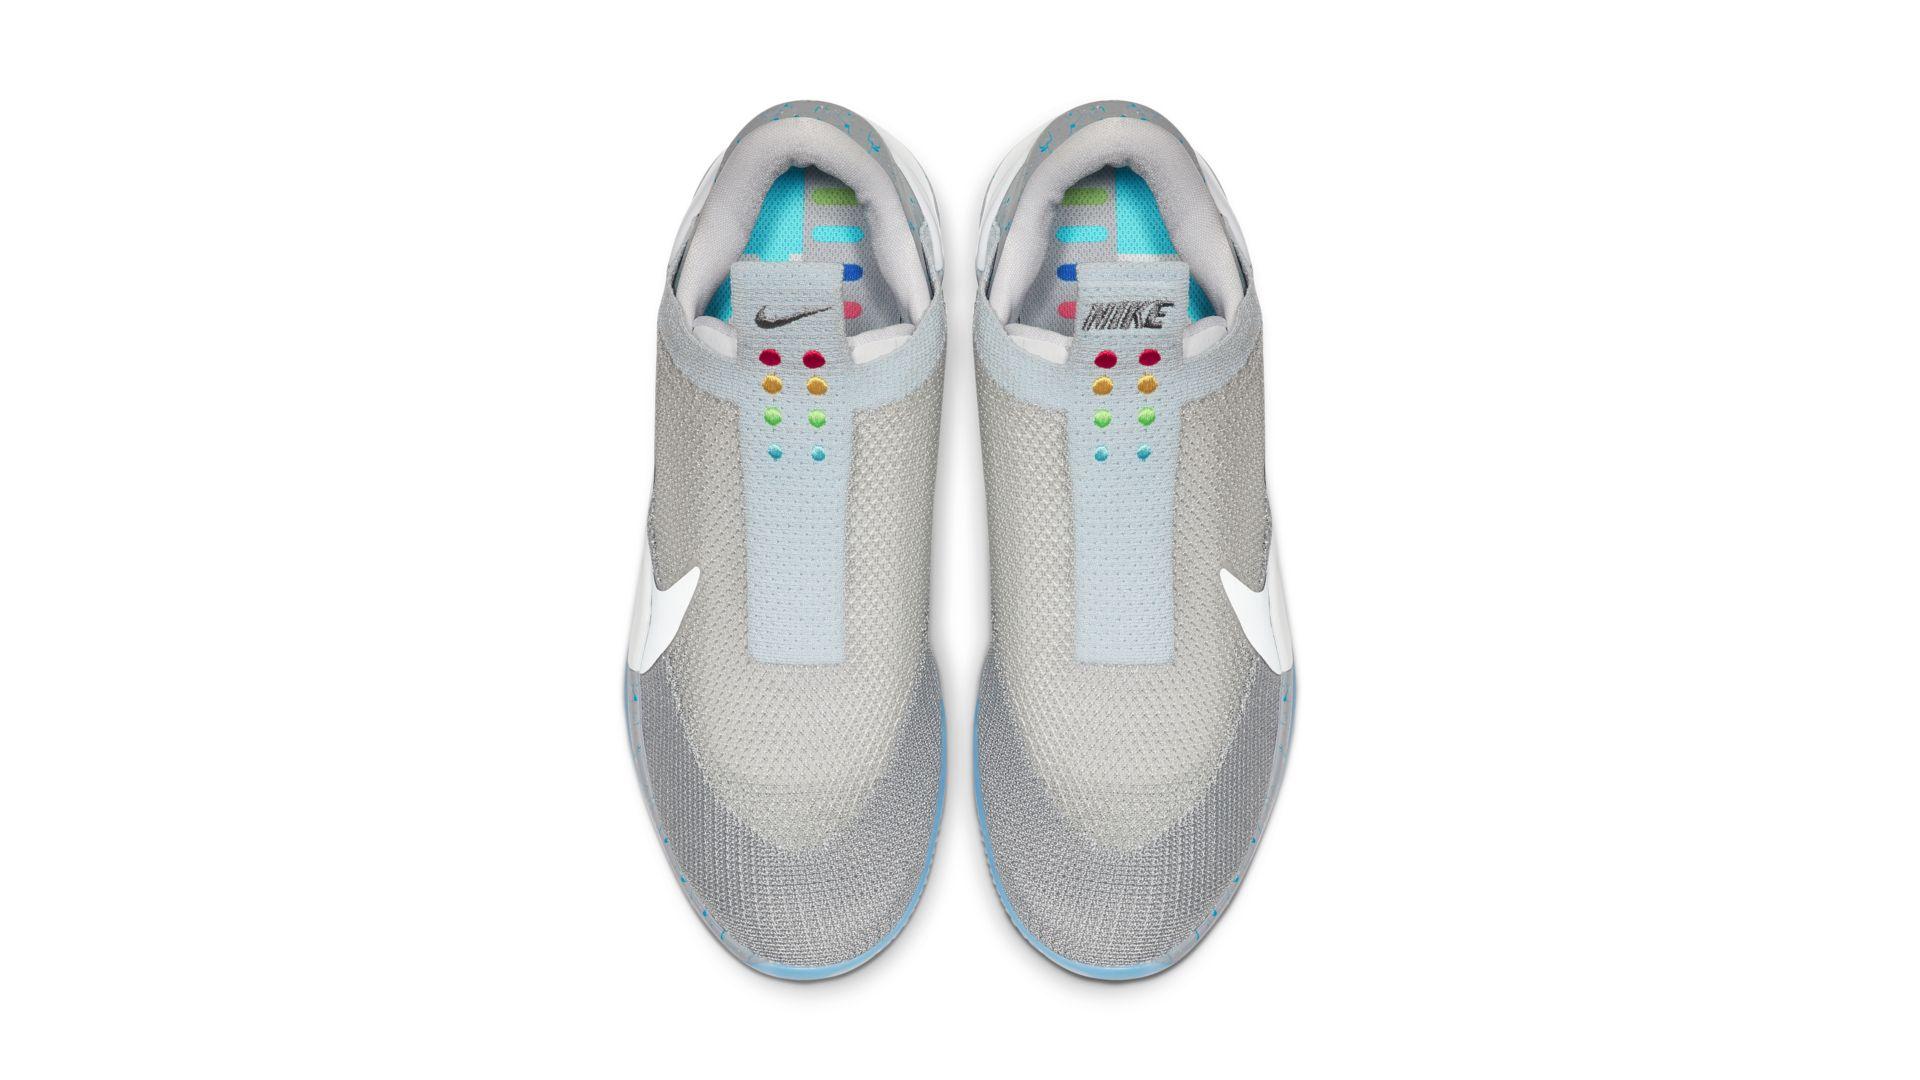 Nike Adapt BB Mag (EU Charger) (CJ5773 090)